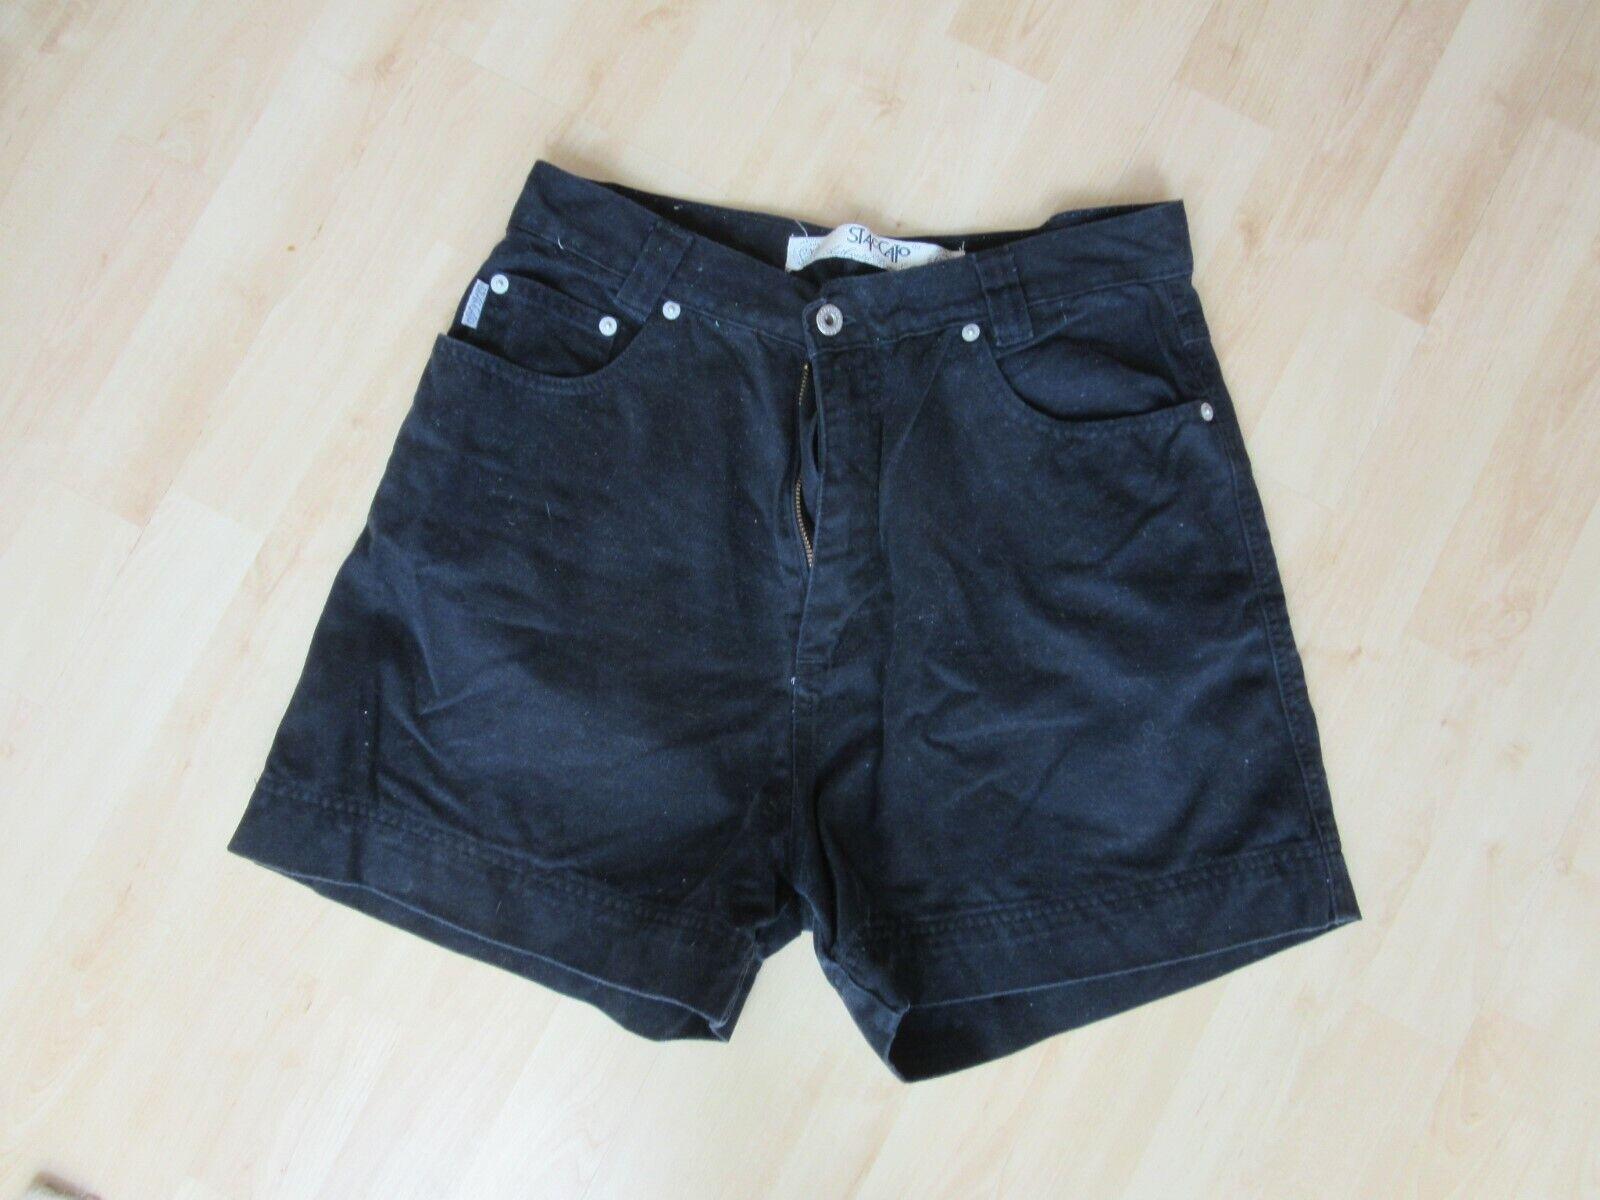 Kurze Hose, schwarz, Staccato, Größe M,